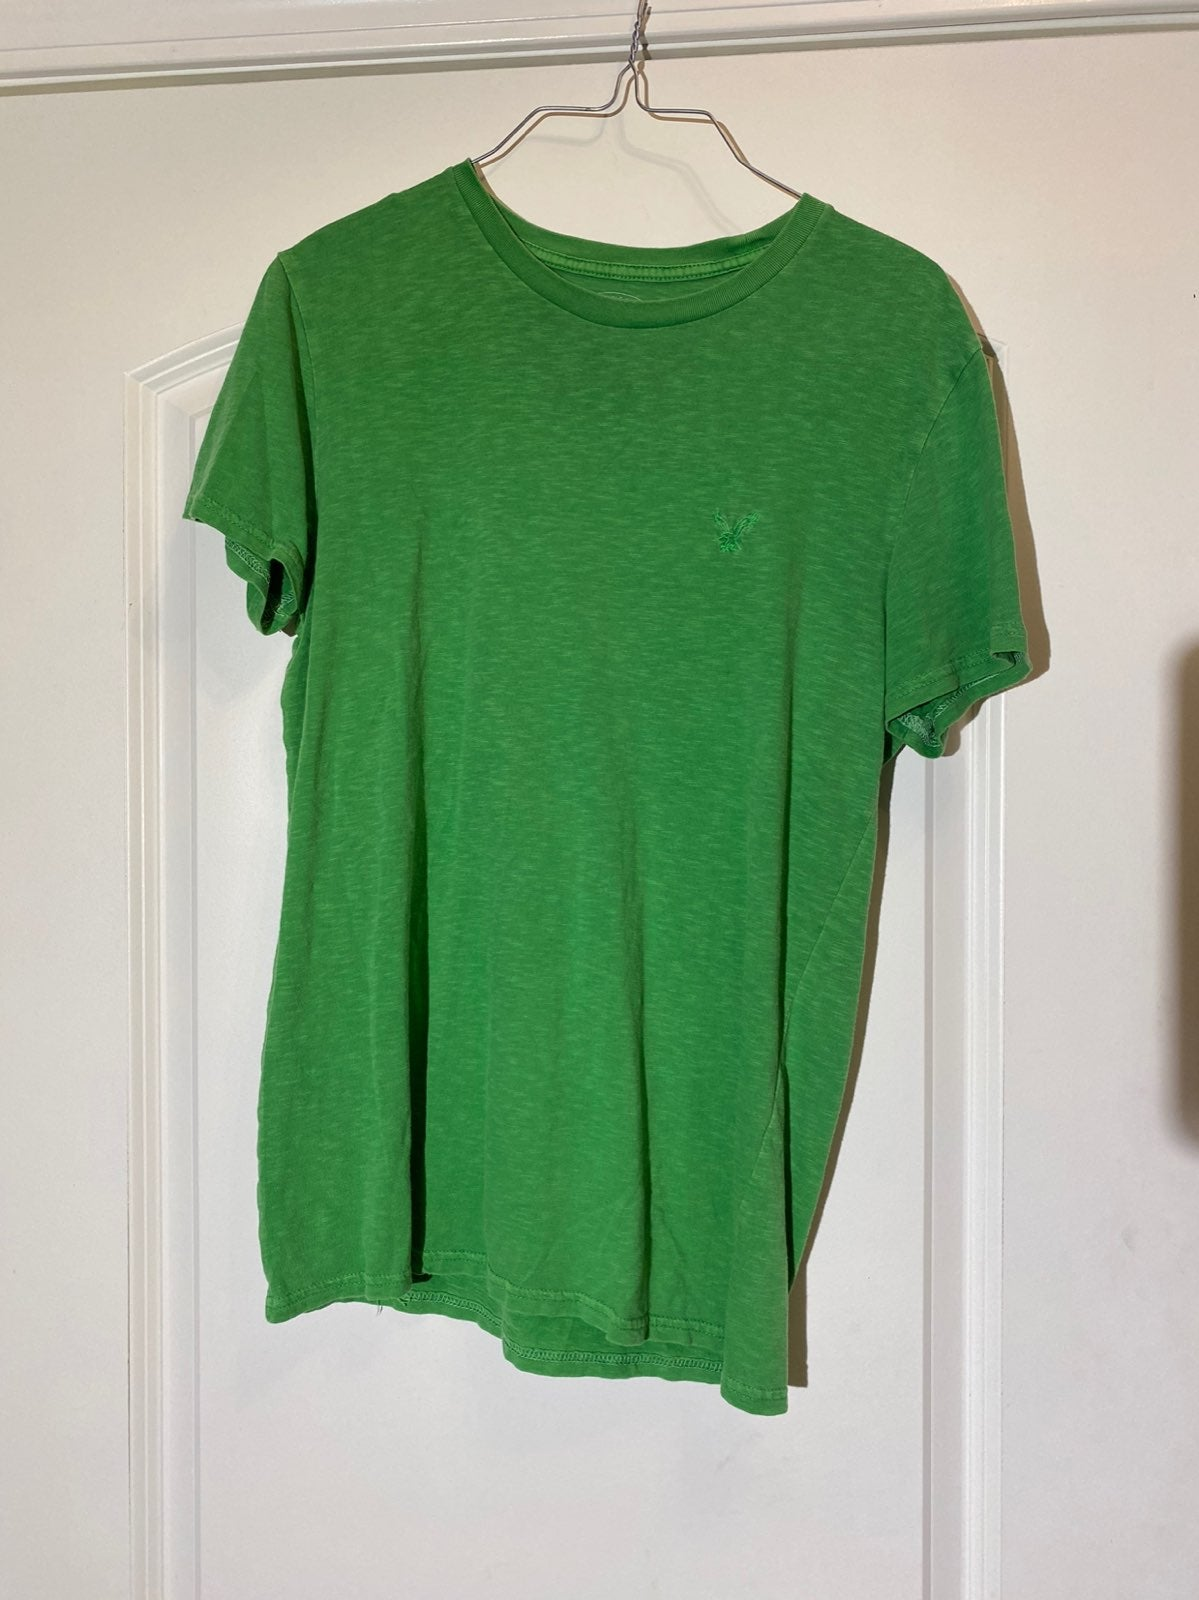 Mens American Eagle green shirt